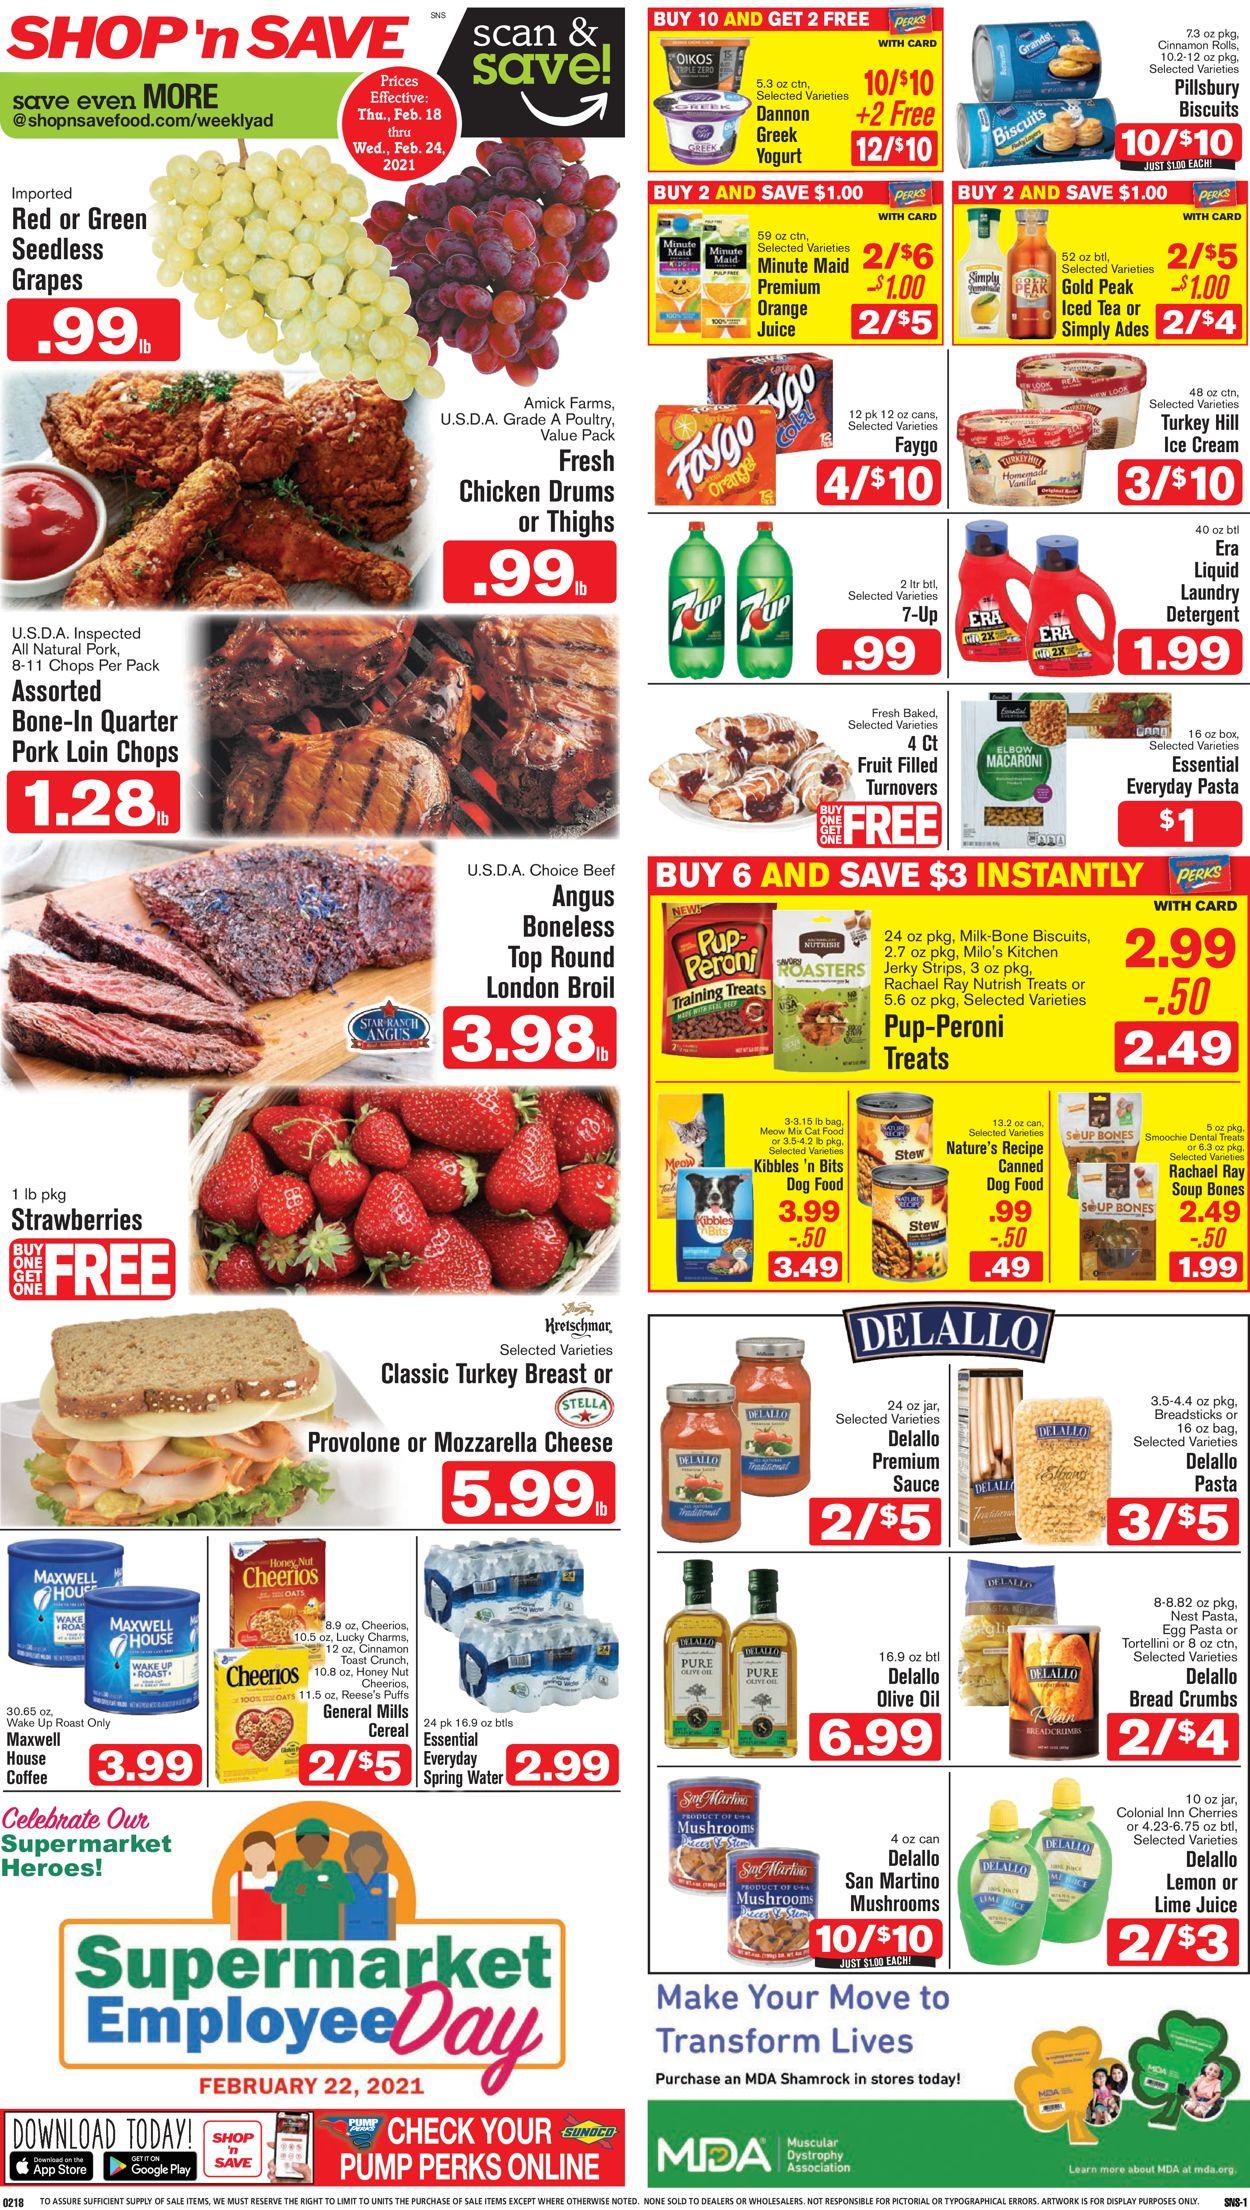 Shop 'n Save (Pittsburgh) Weekly Ad Circular - valid 02/18-02/24/2021